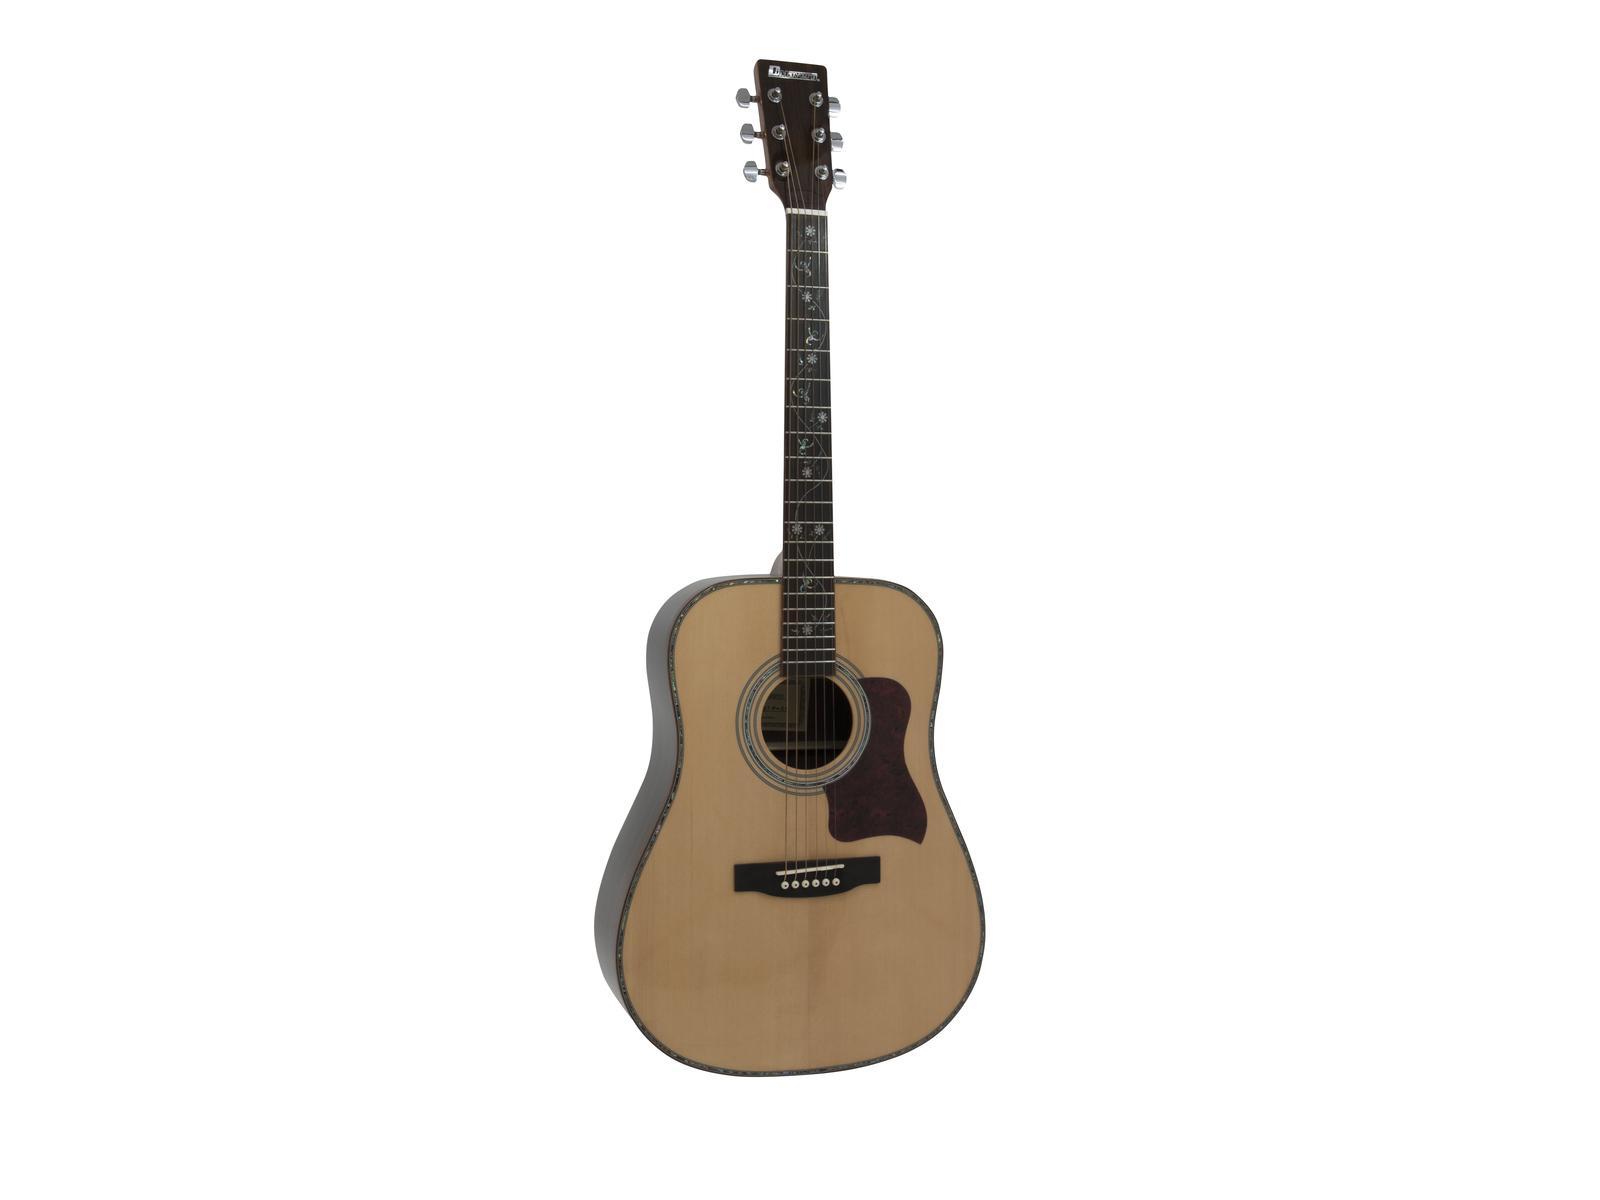 Chitarra acustica, western, colore nature, abete solido, DIMAVERY STW-20